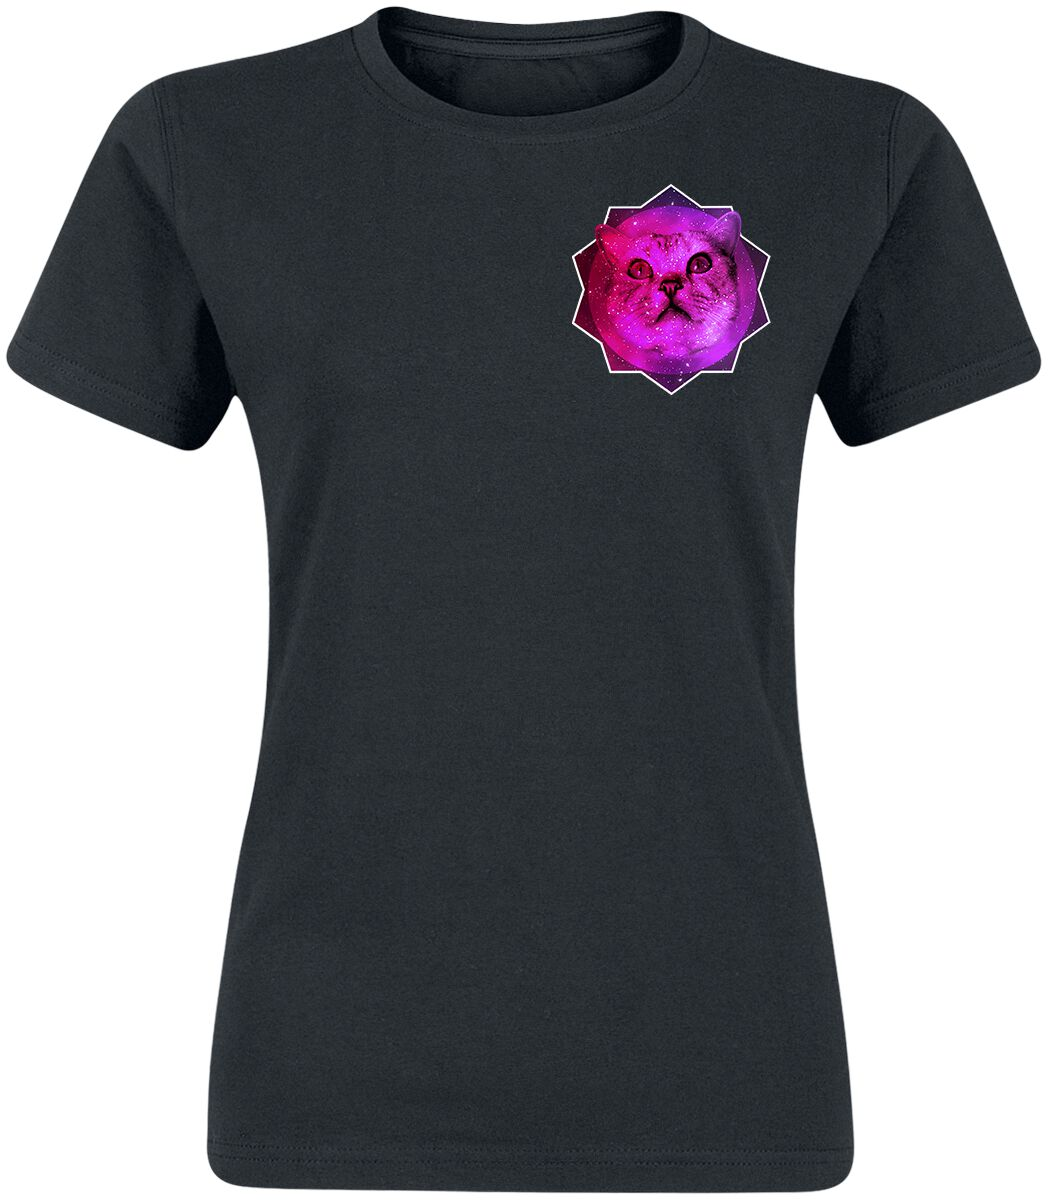 janina_miau Catnip T-Shirt schwarz POD - FOTL VW - Catnip